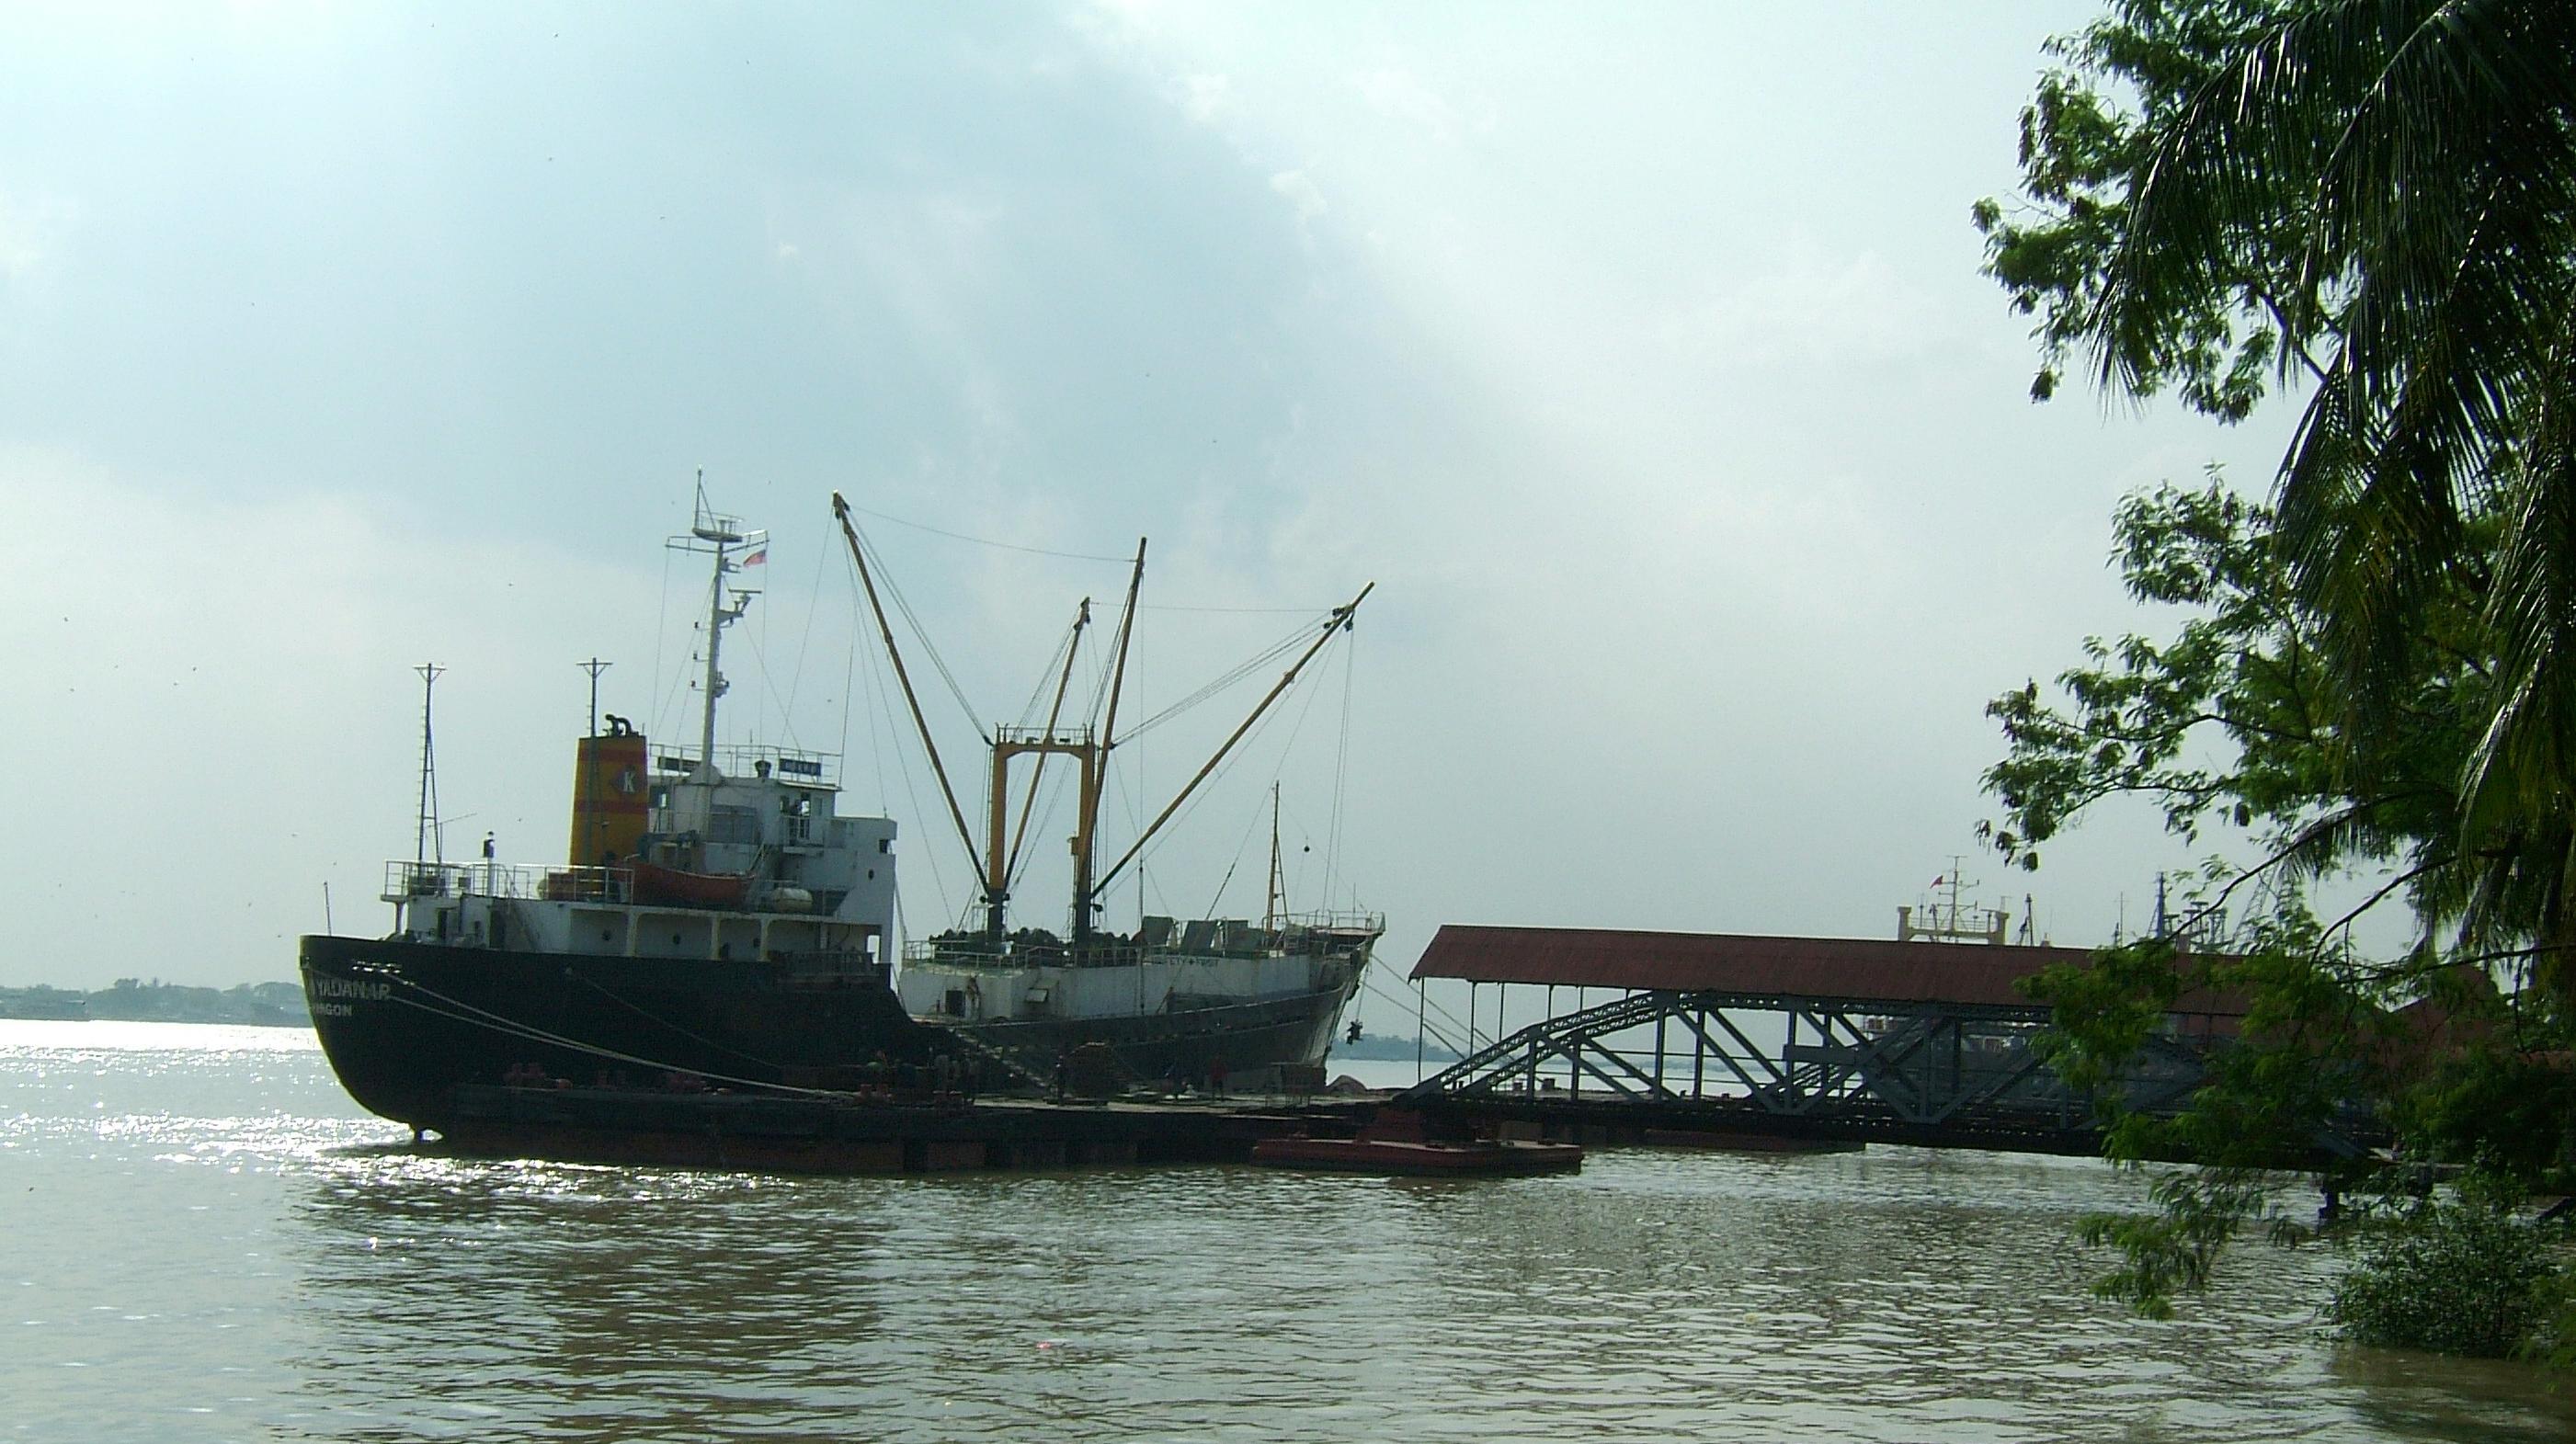 MV Kyaw Yadanar Yangon port Myanmar Oct 2004 02